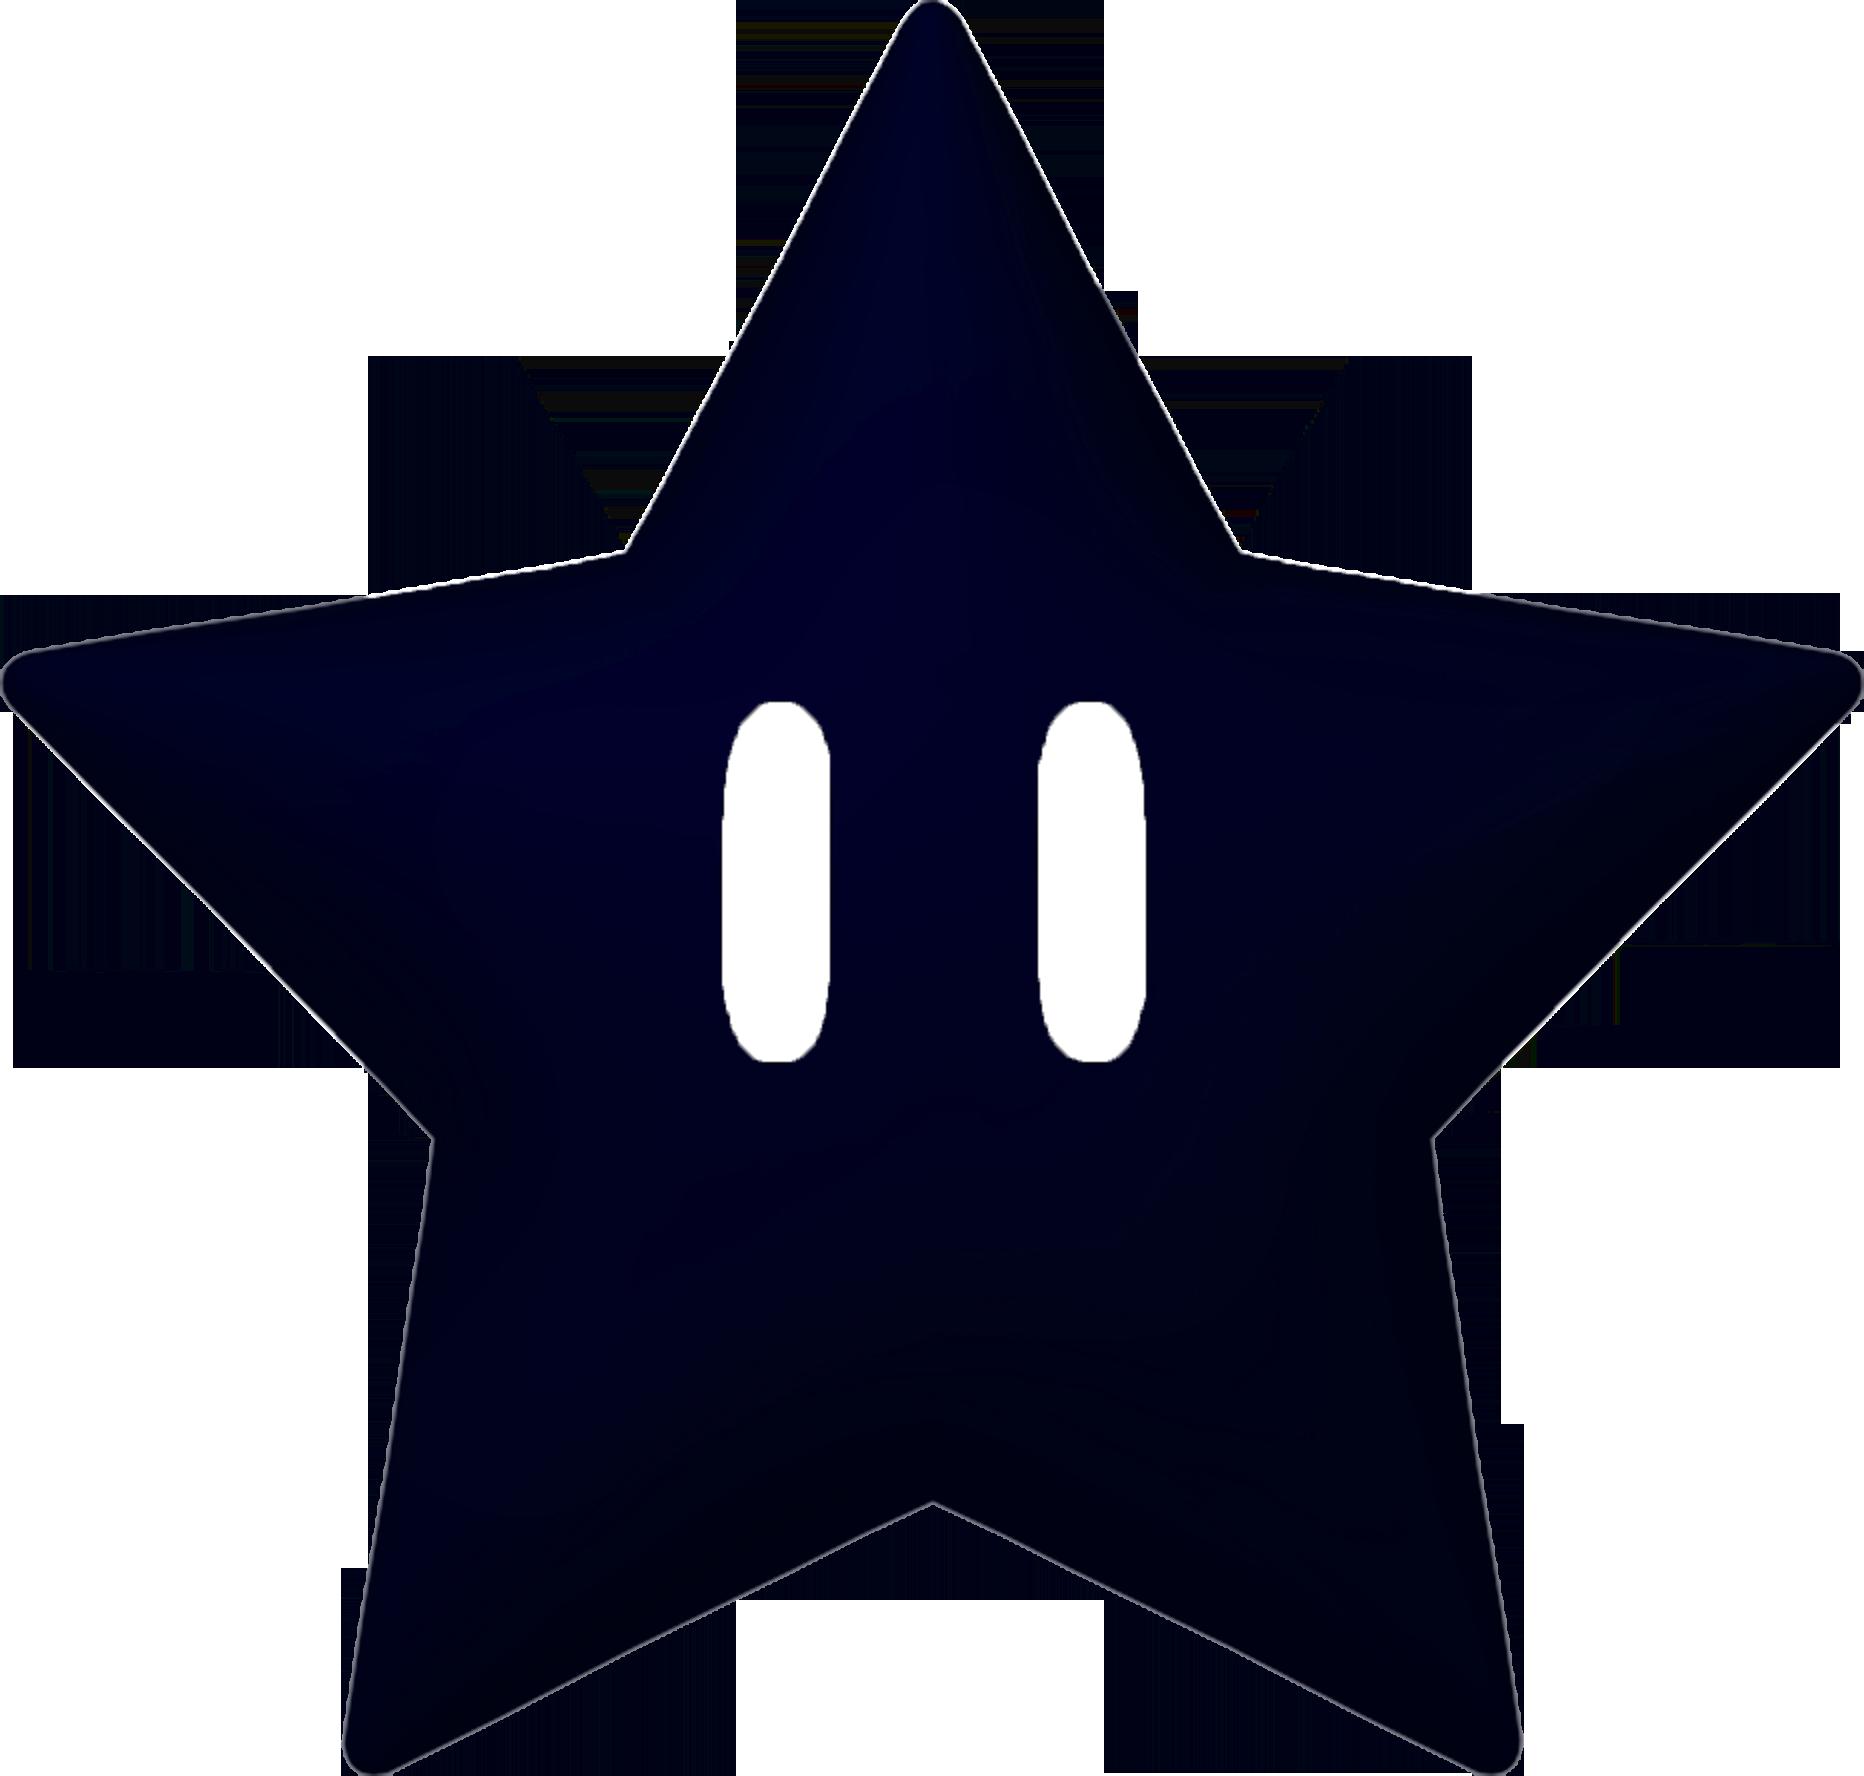 Download Mario Kart Wii Super Mario Blue Star Png Image